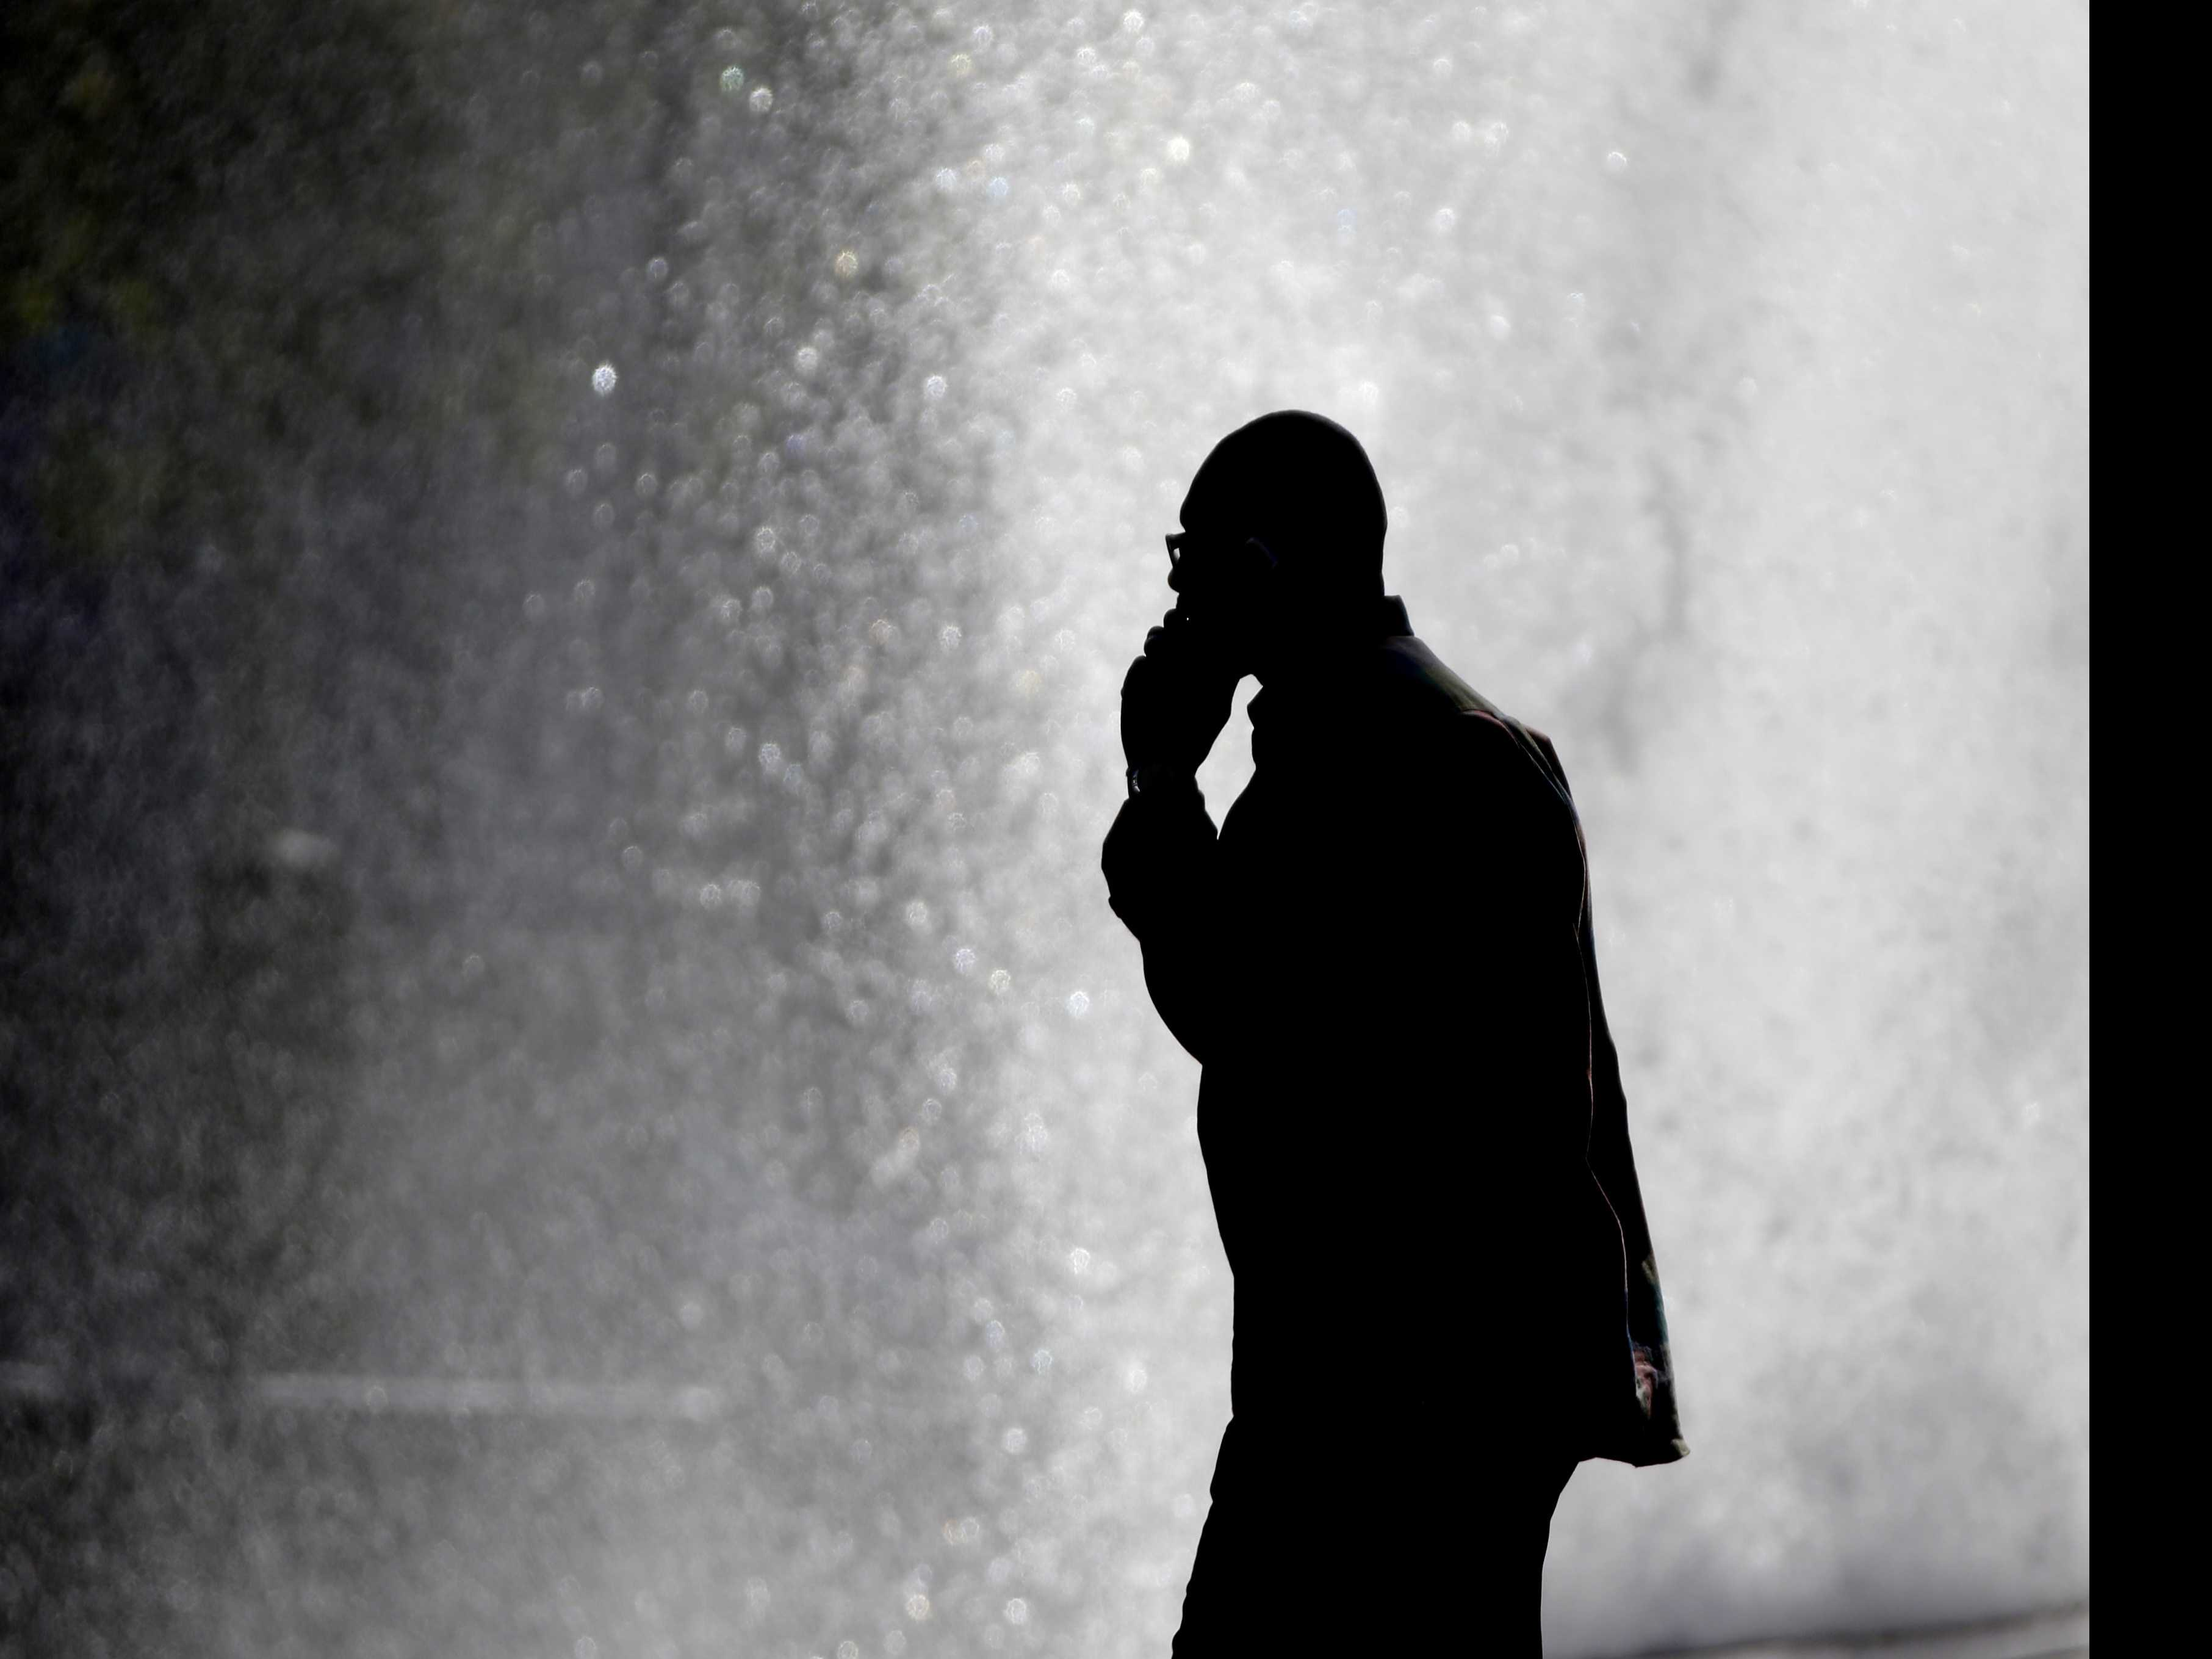 Cross Talk: Federal Agencies Clash on Cellphone Cancer Risk